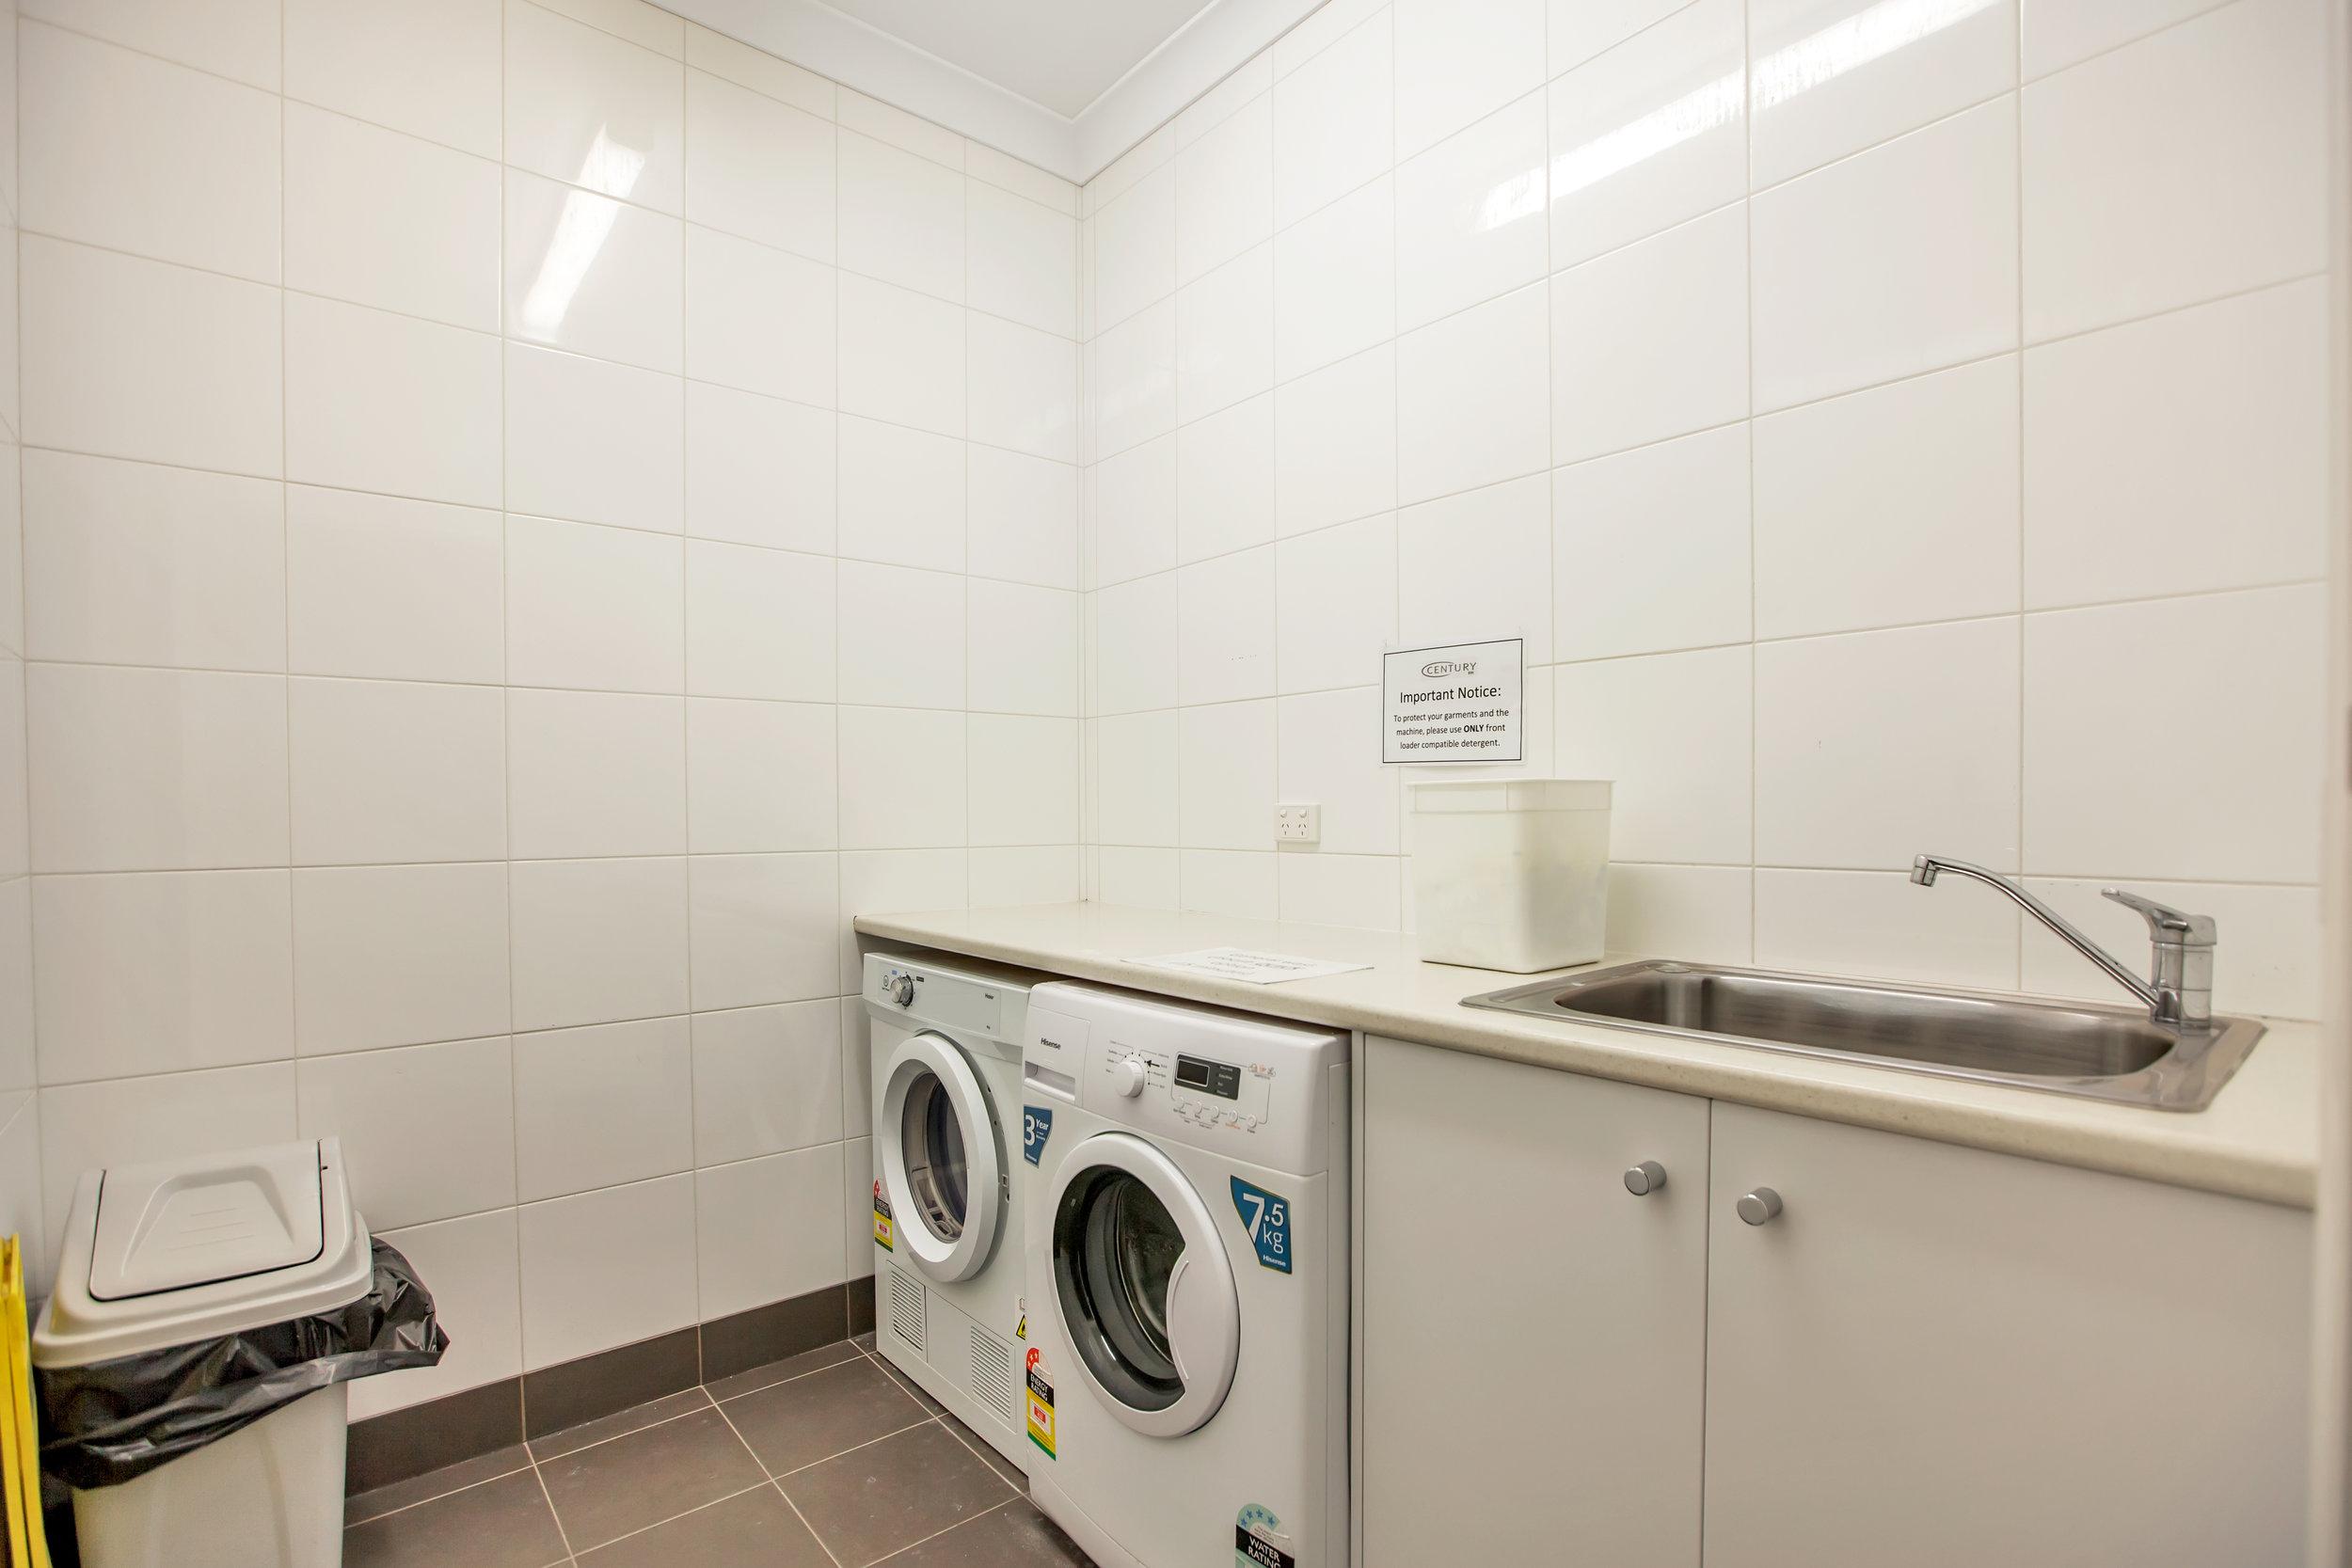 Facilities - Laundry.jpg